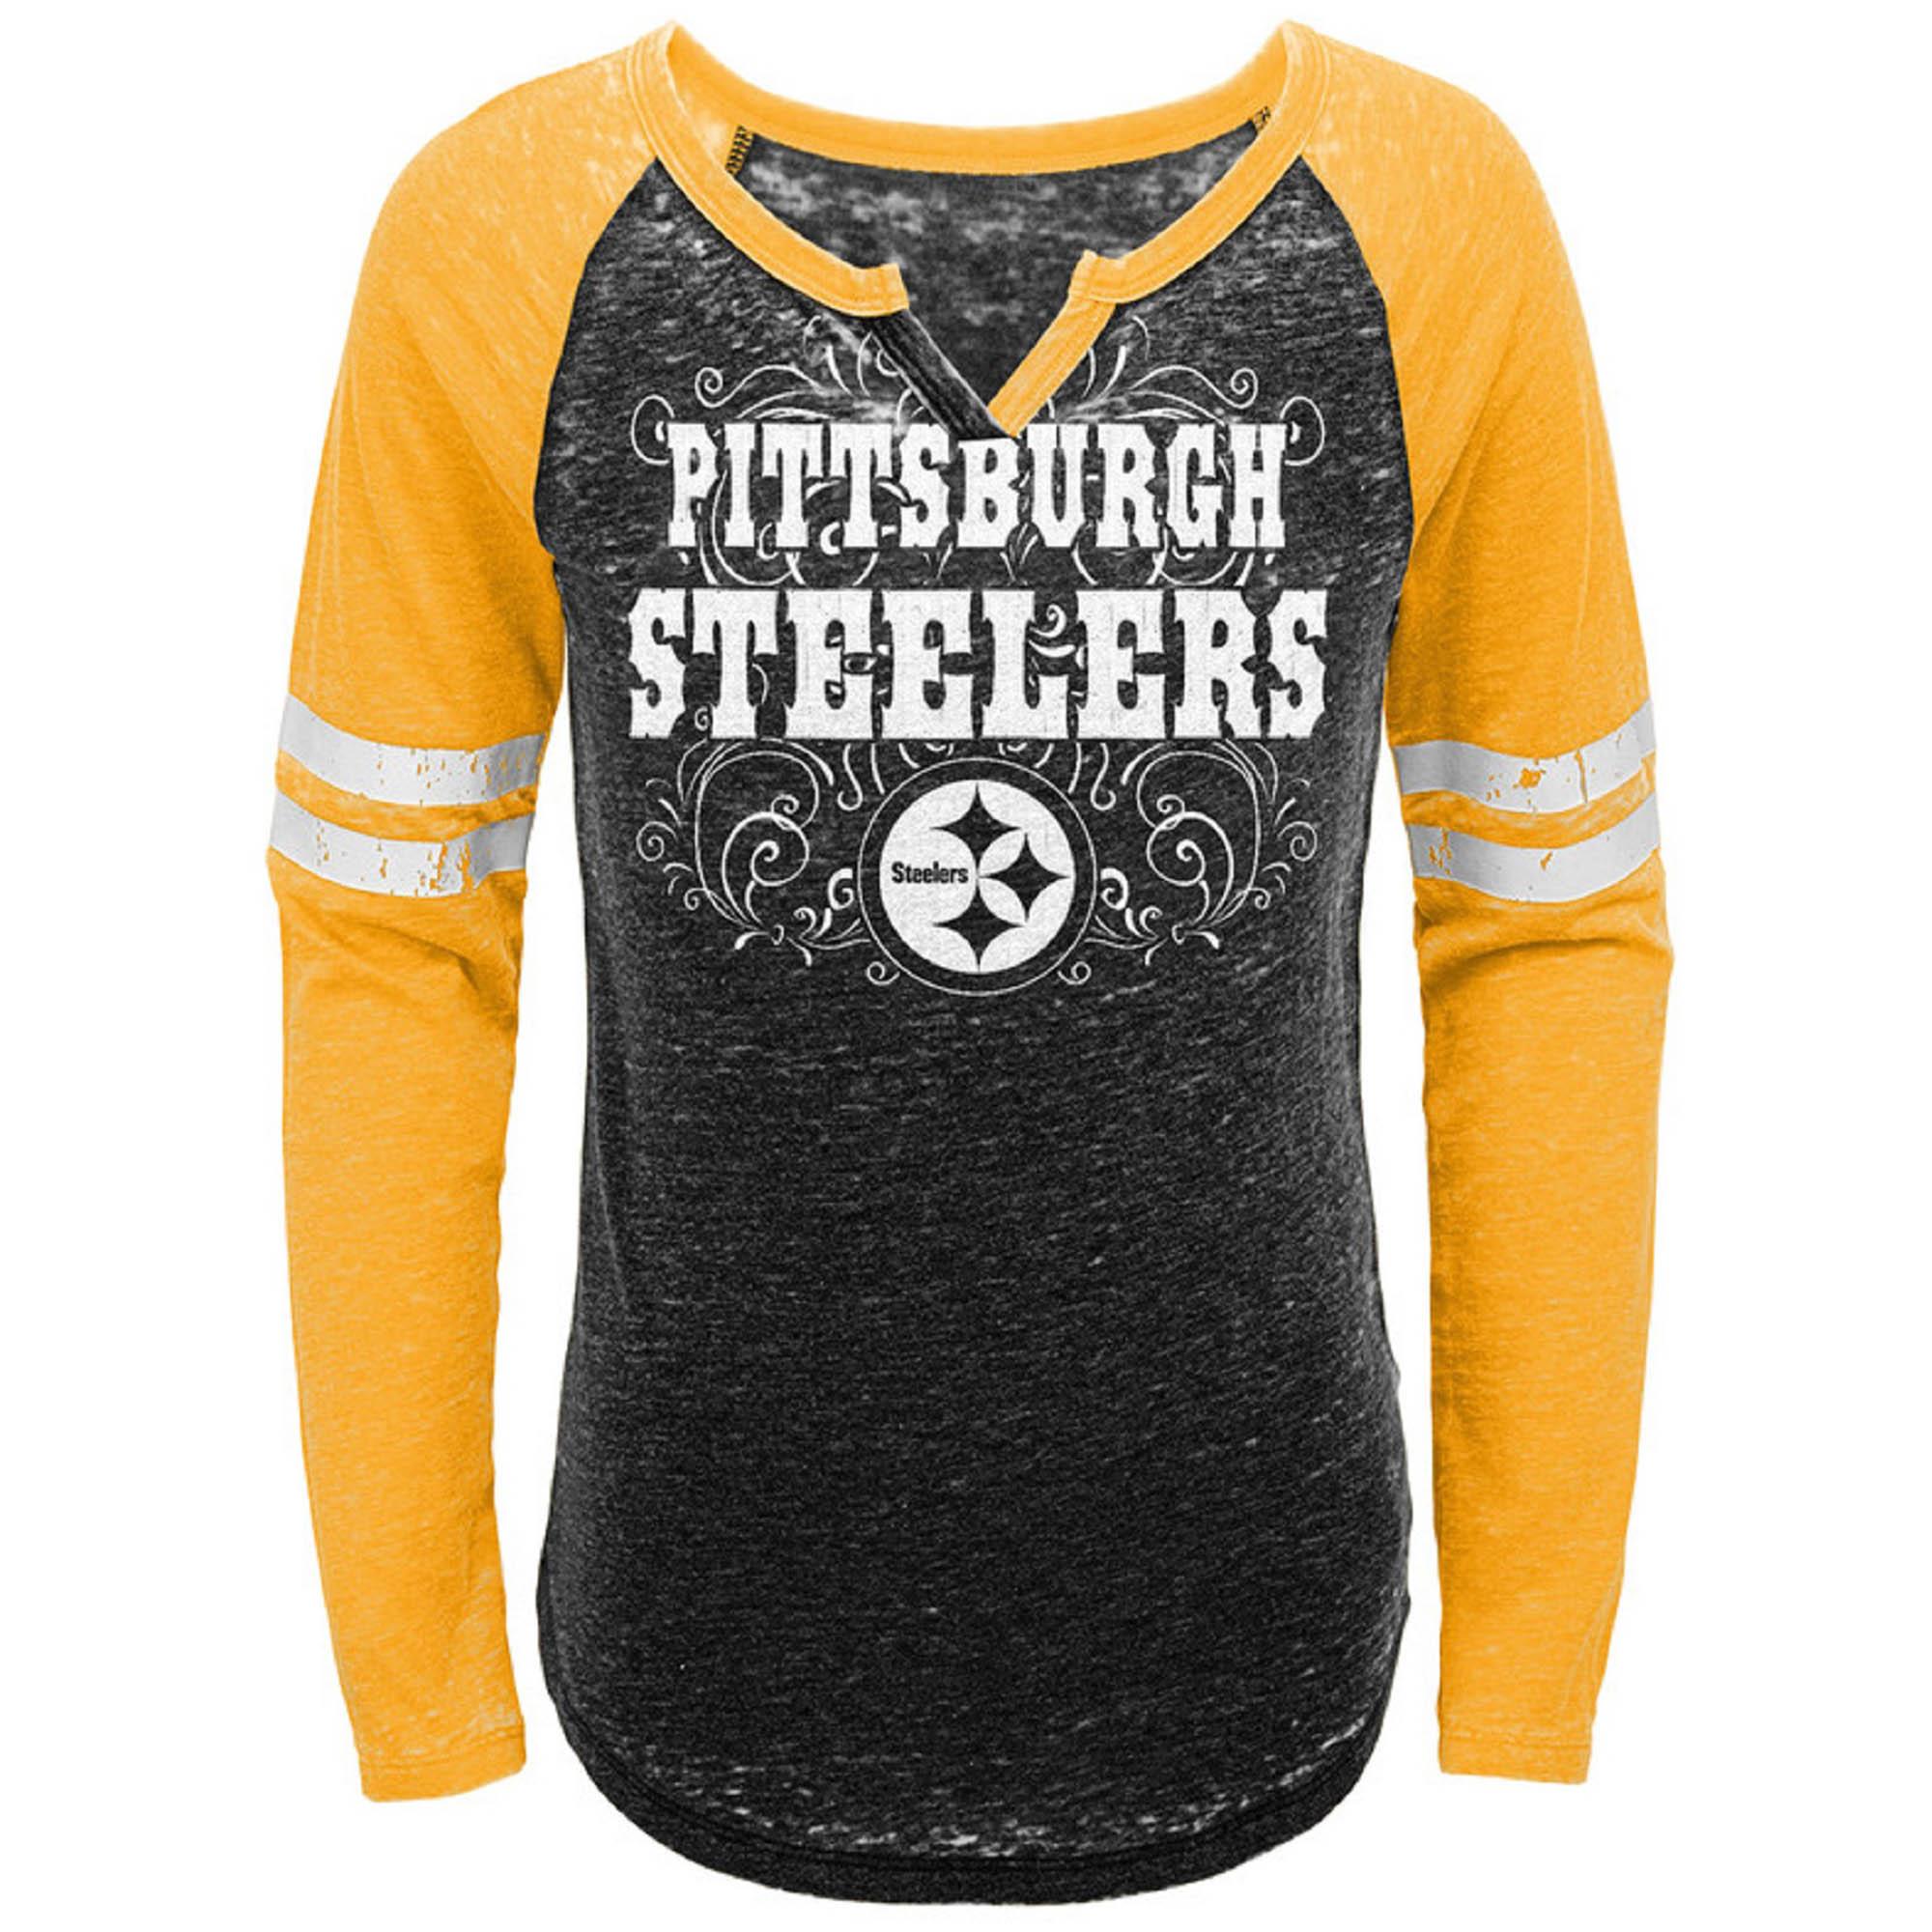 Girls Youth Black/Gold Pittsburgh Steelers Burnout Long Sleeve V-Notch T-Shirt